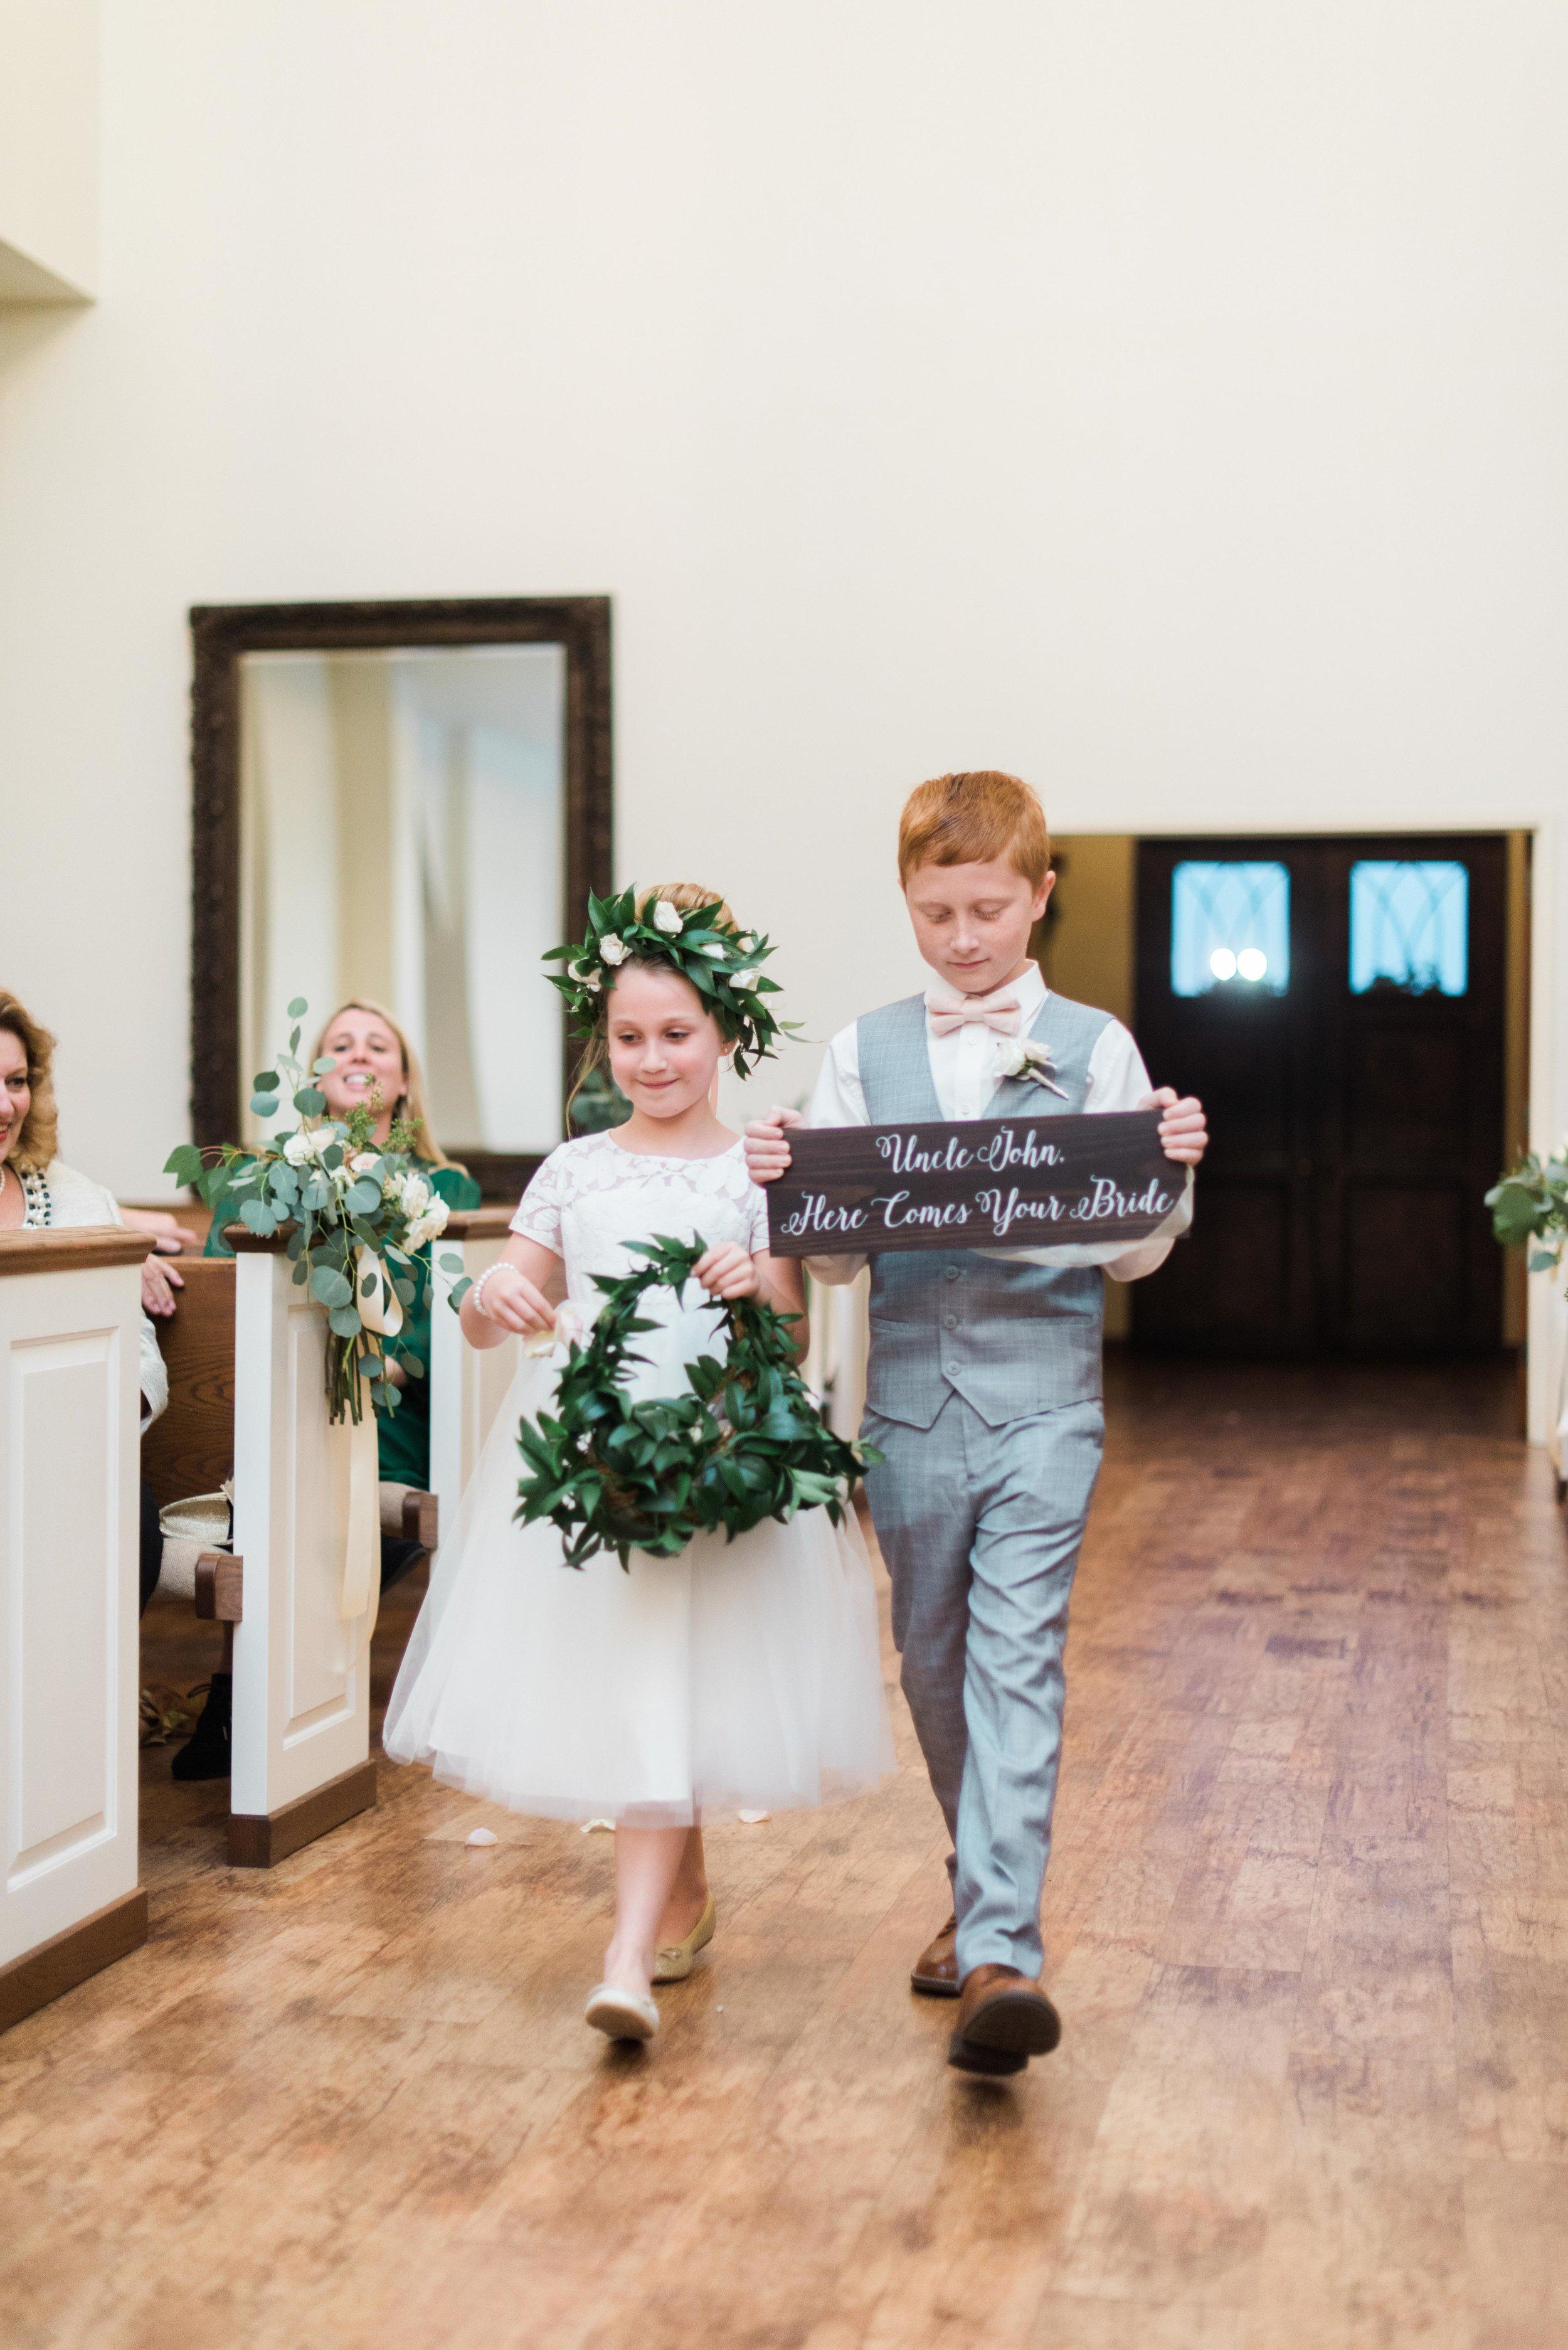 Briscoe-Manor-Houston-Wedding-Photographer-Modern-Luxury-Weddings-Dana-Fernandez-Photograpy-Fine-Art-Photographer-Houston-Film-Destination-PNW-Wedding-Photographer-20.jpg